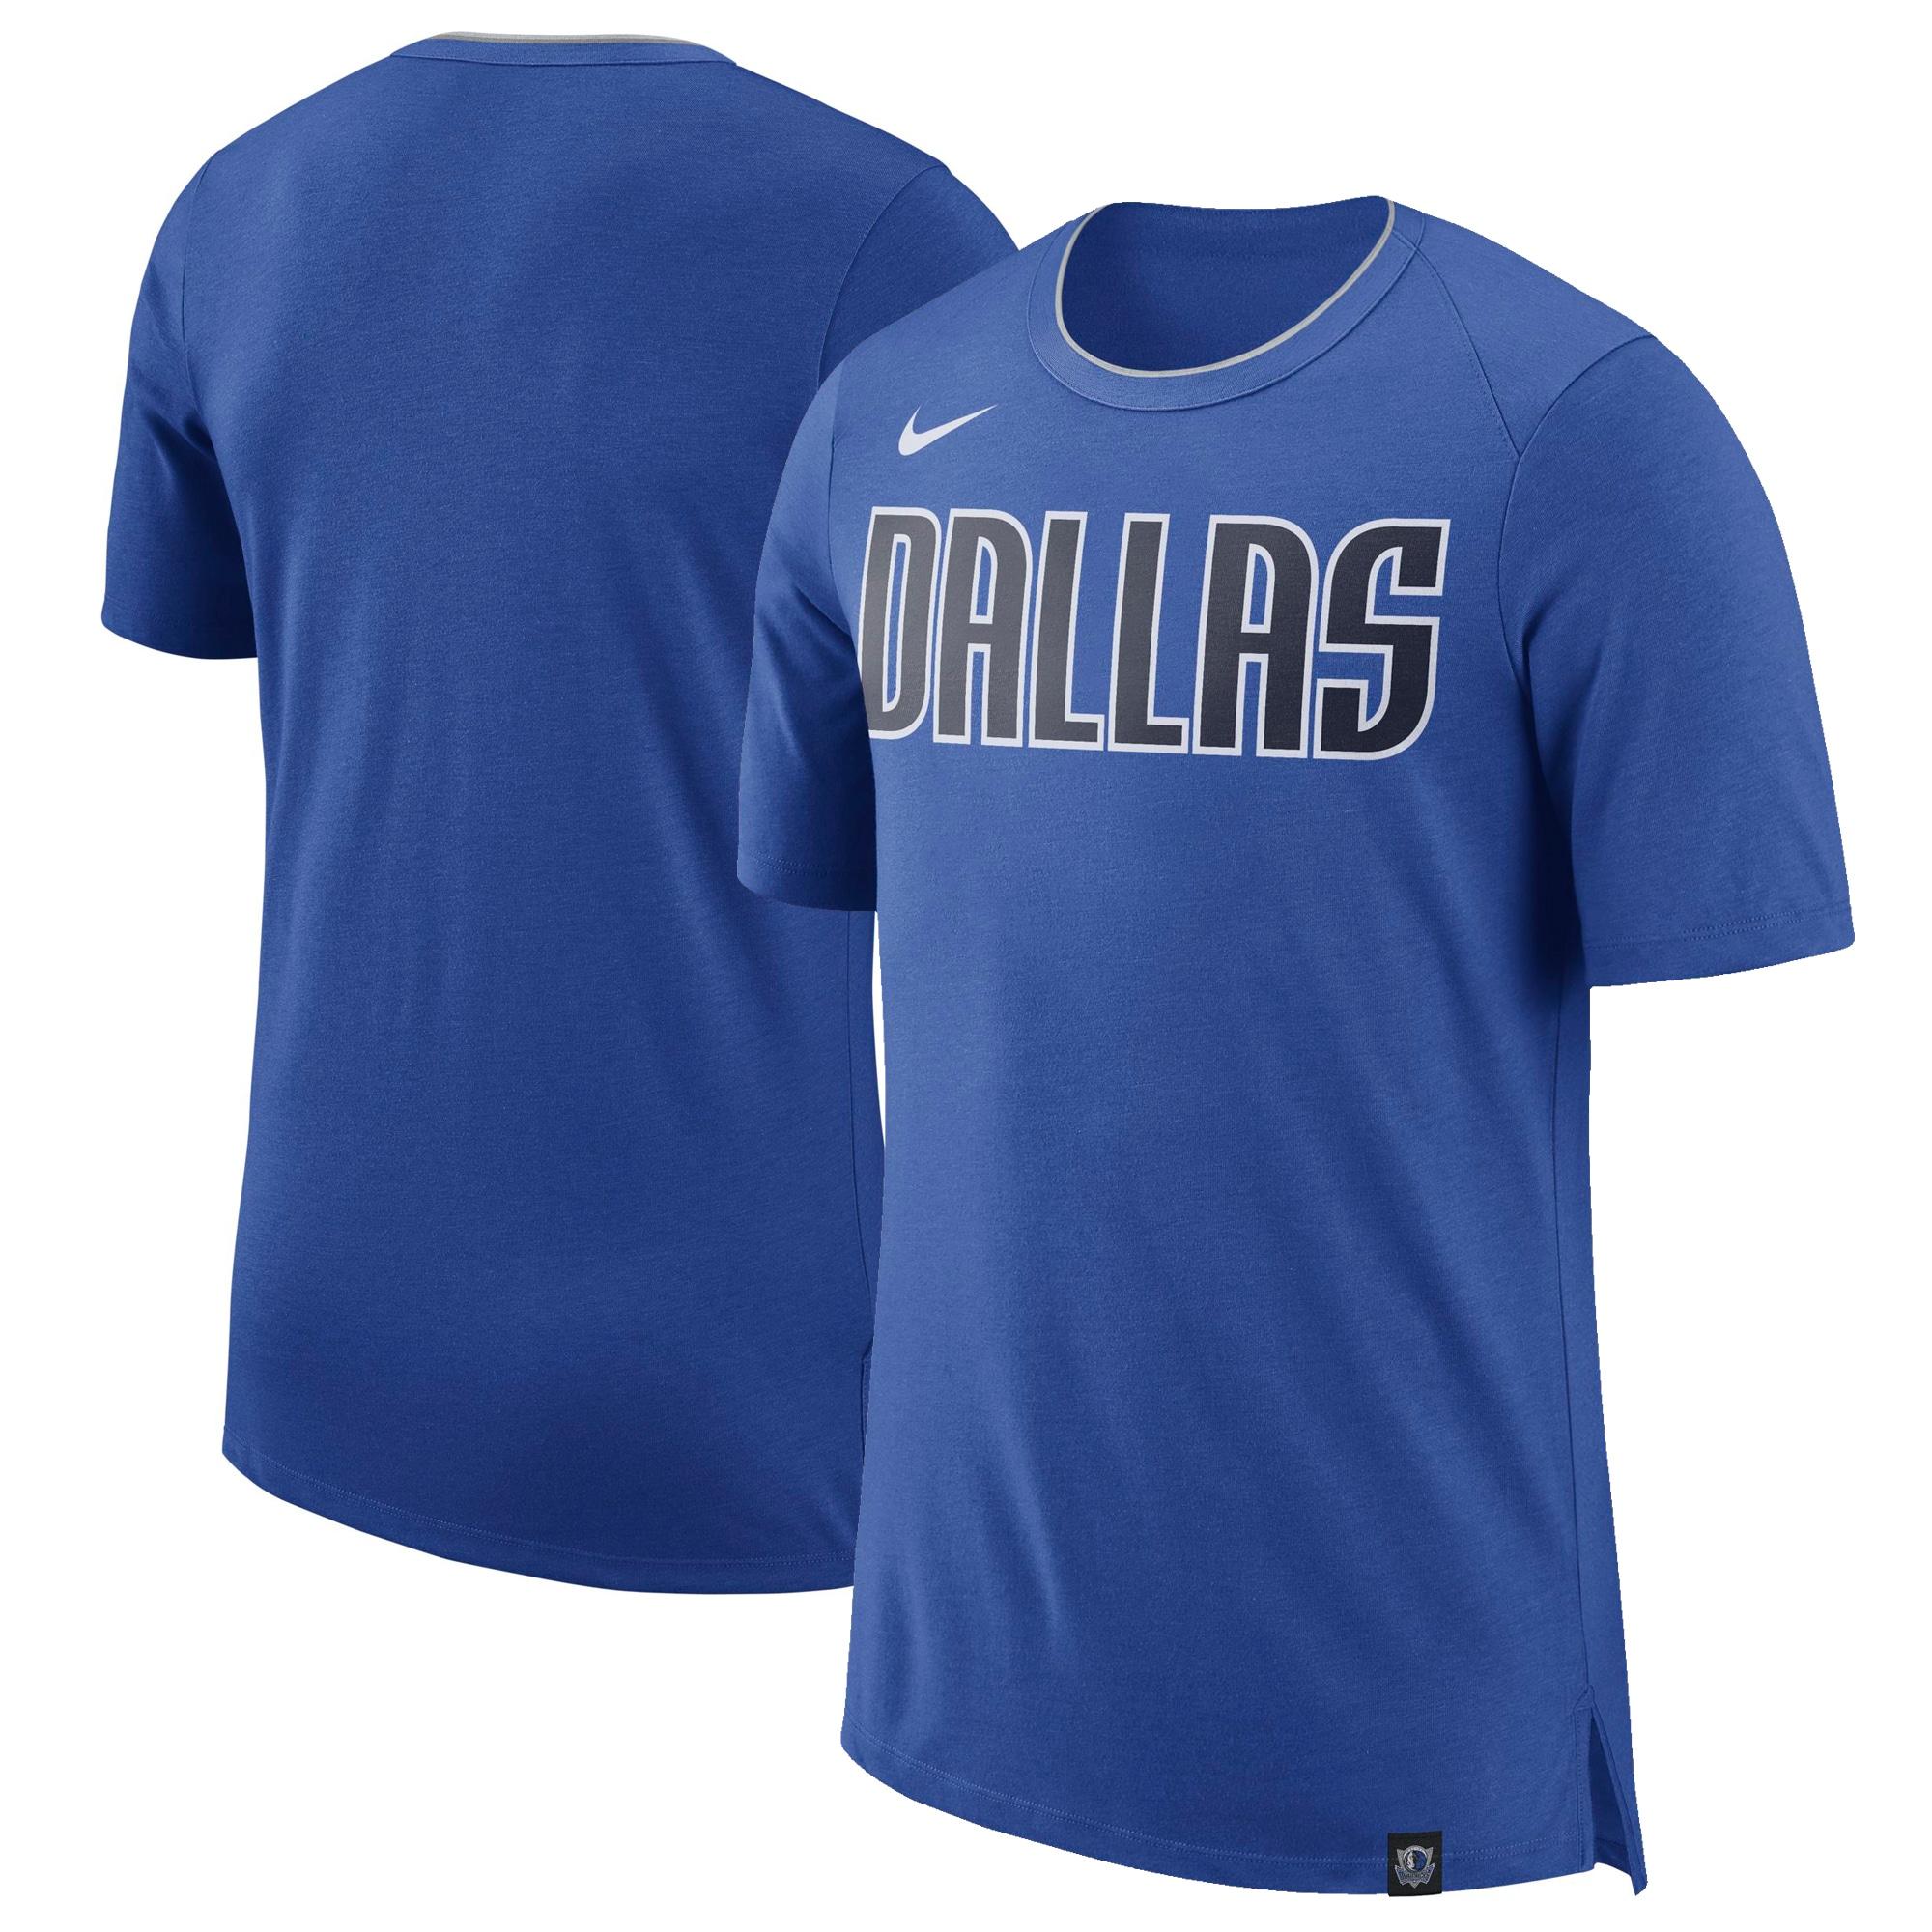 Dallas Mavericks Nike Basketball Fan T-Shirt - Blue